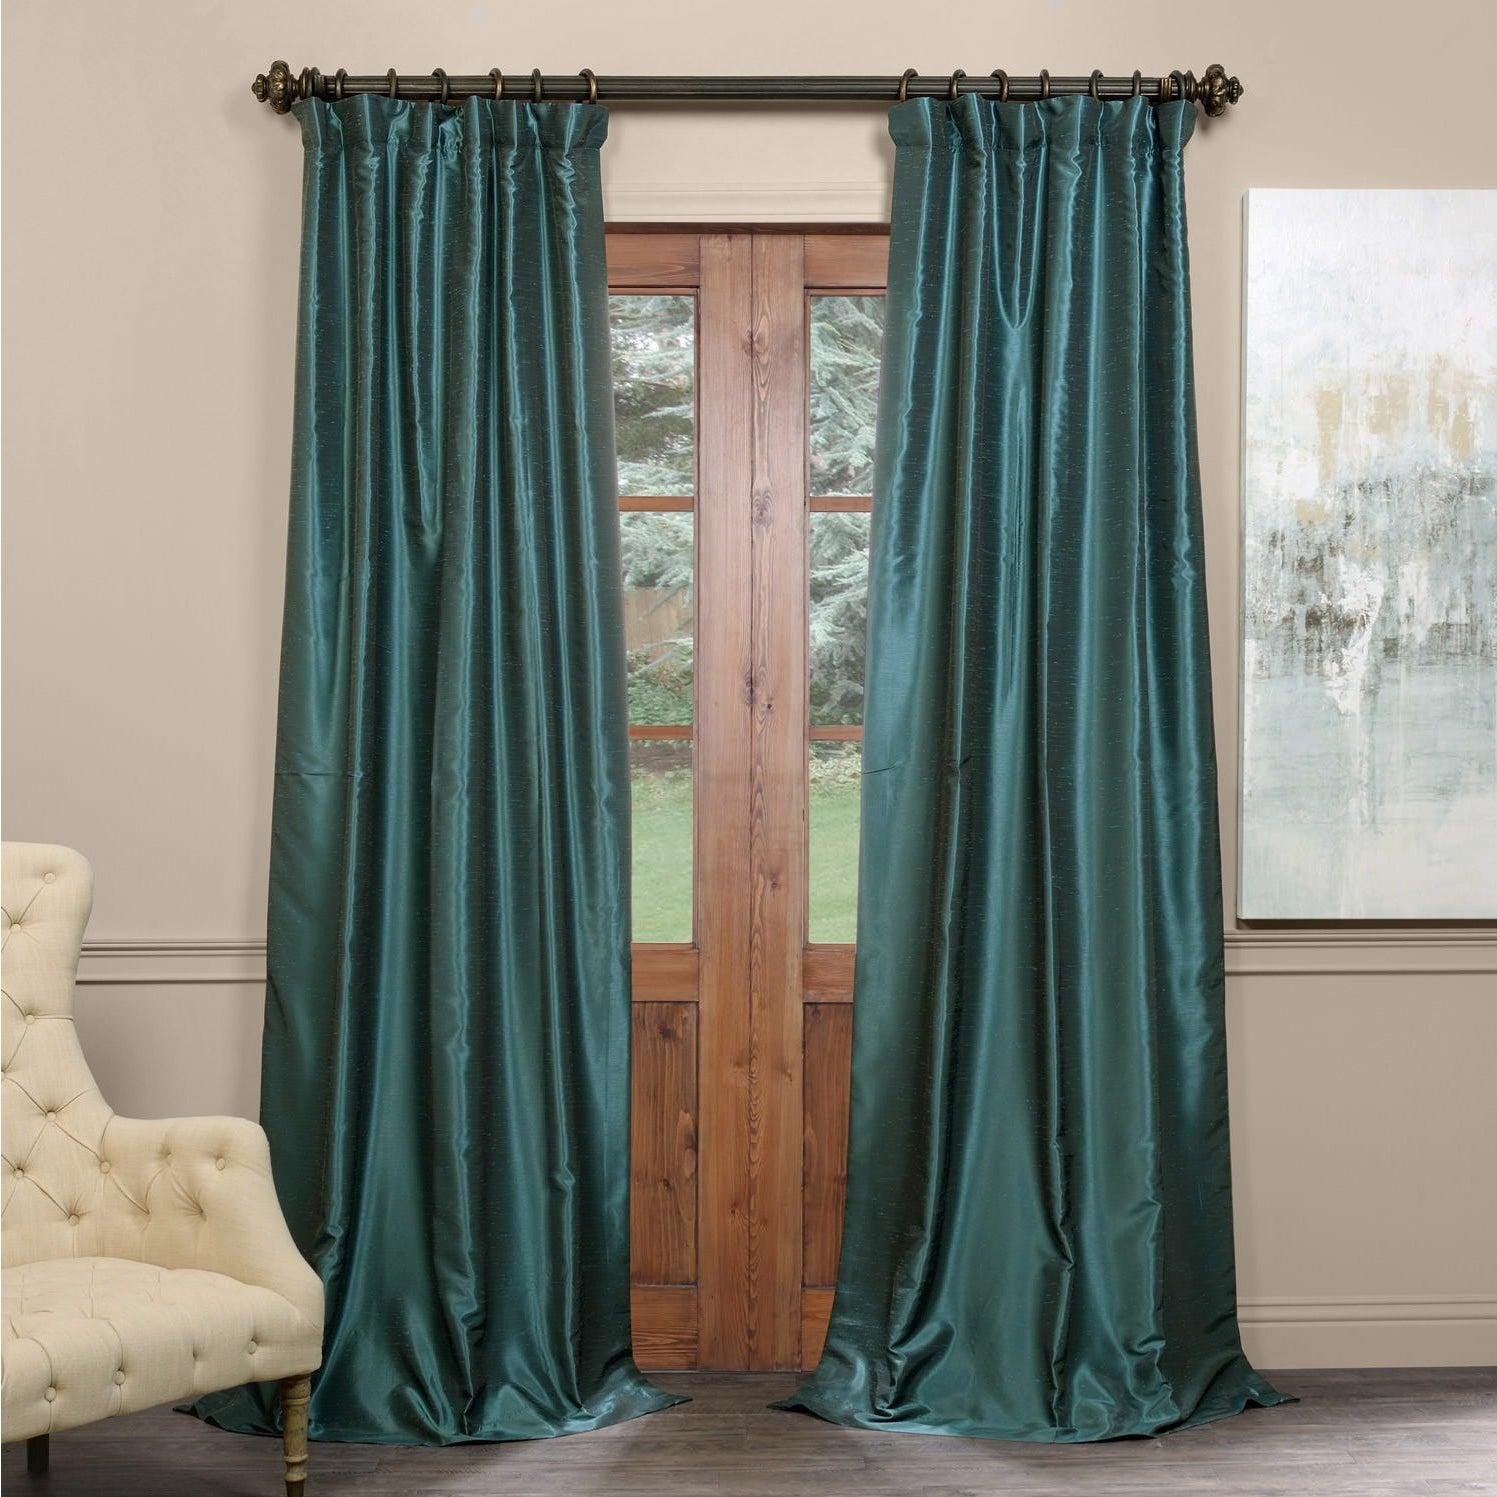 Exclusive Fabrics True Blackout Vintage Textured Faux Dupioni Silk Curtain Panel Inside Off White Vintage Faux Textured Silk Curtains (View 20 of 20)